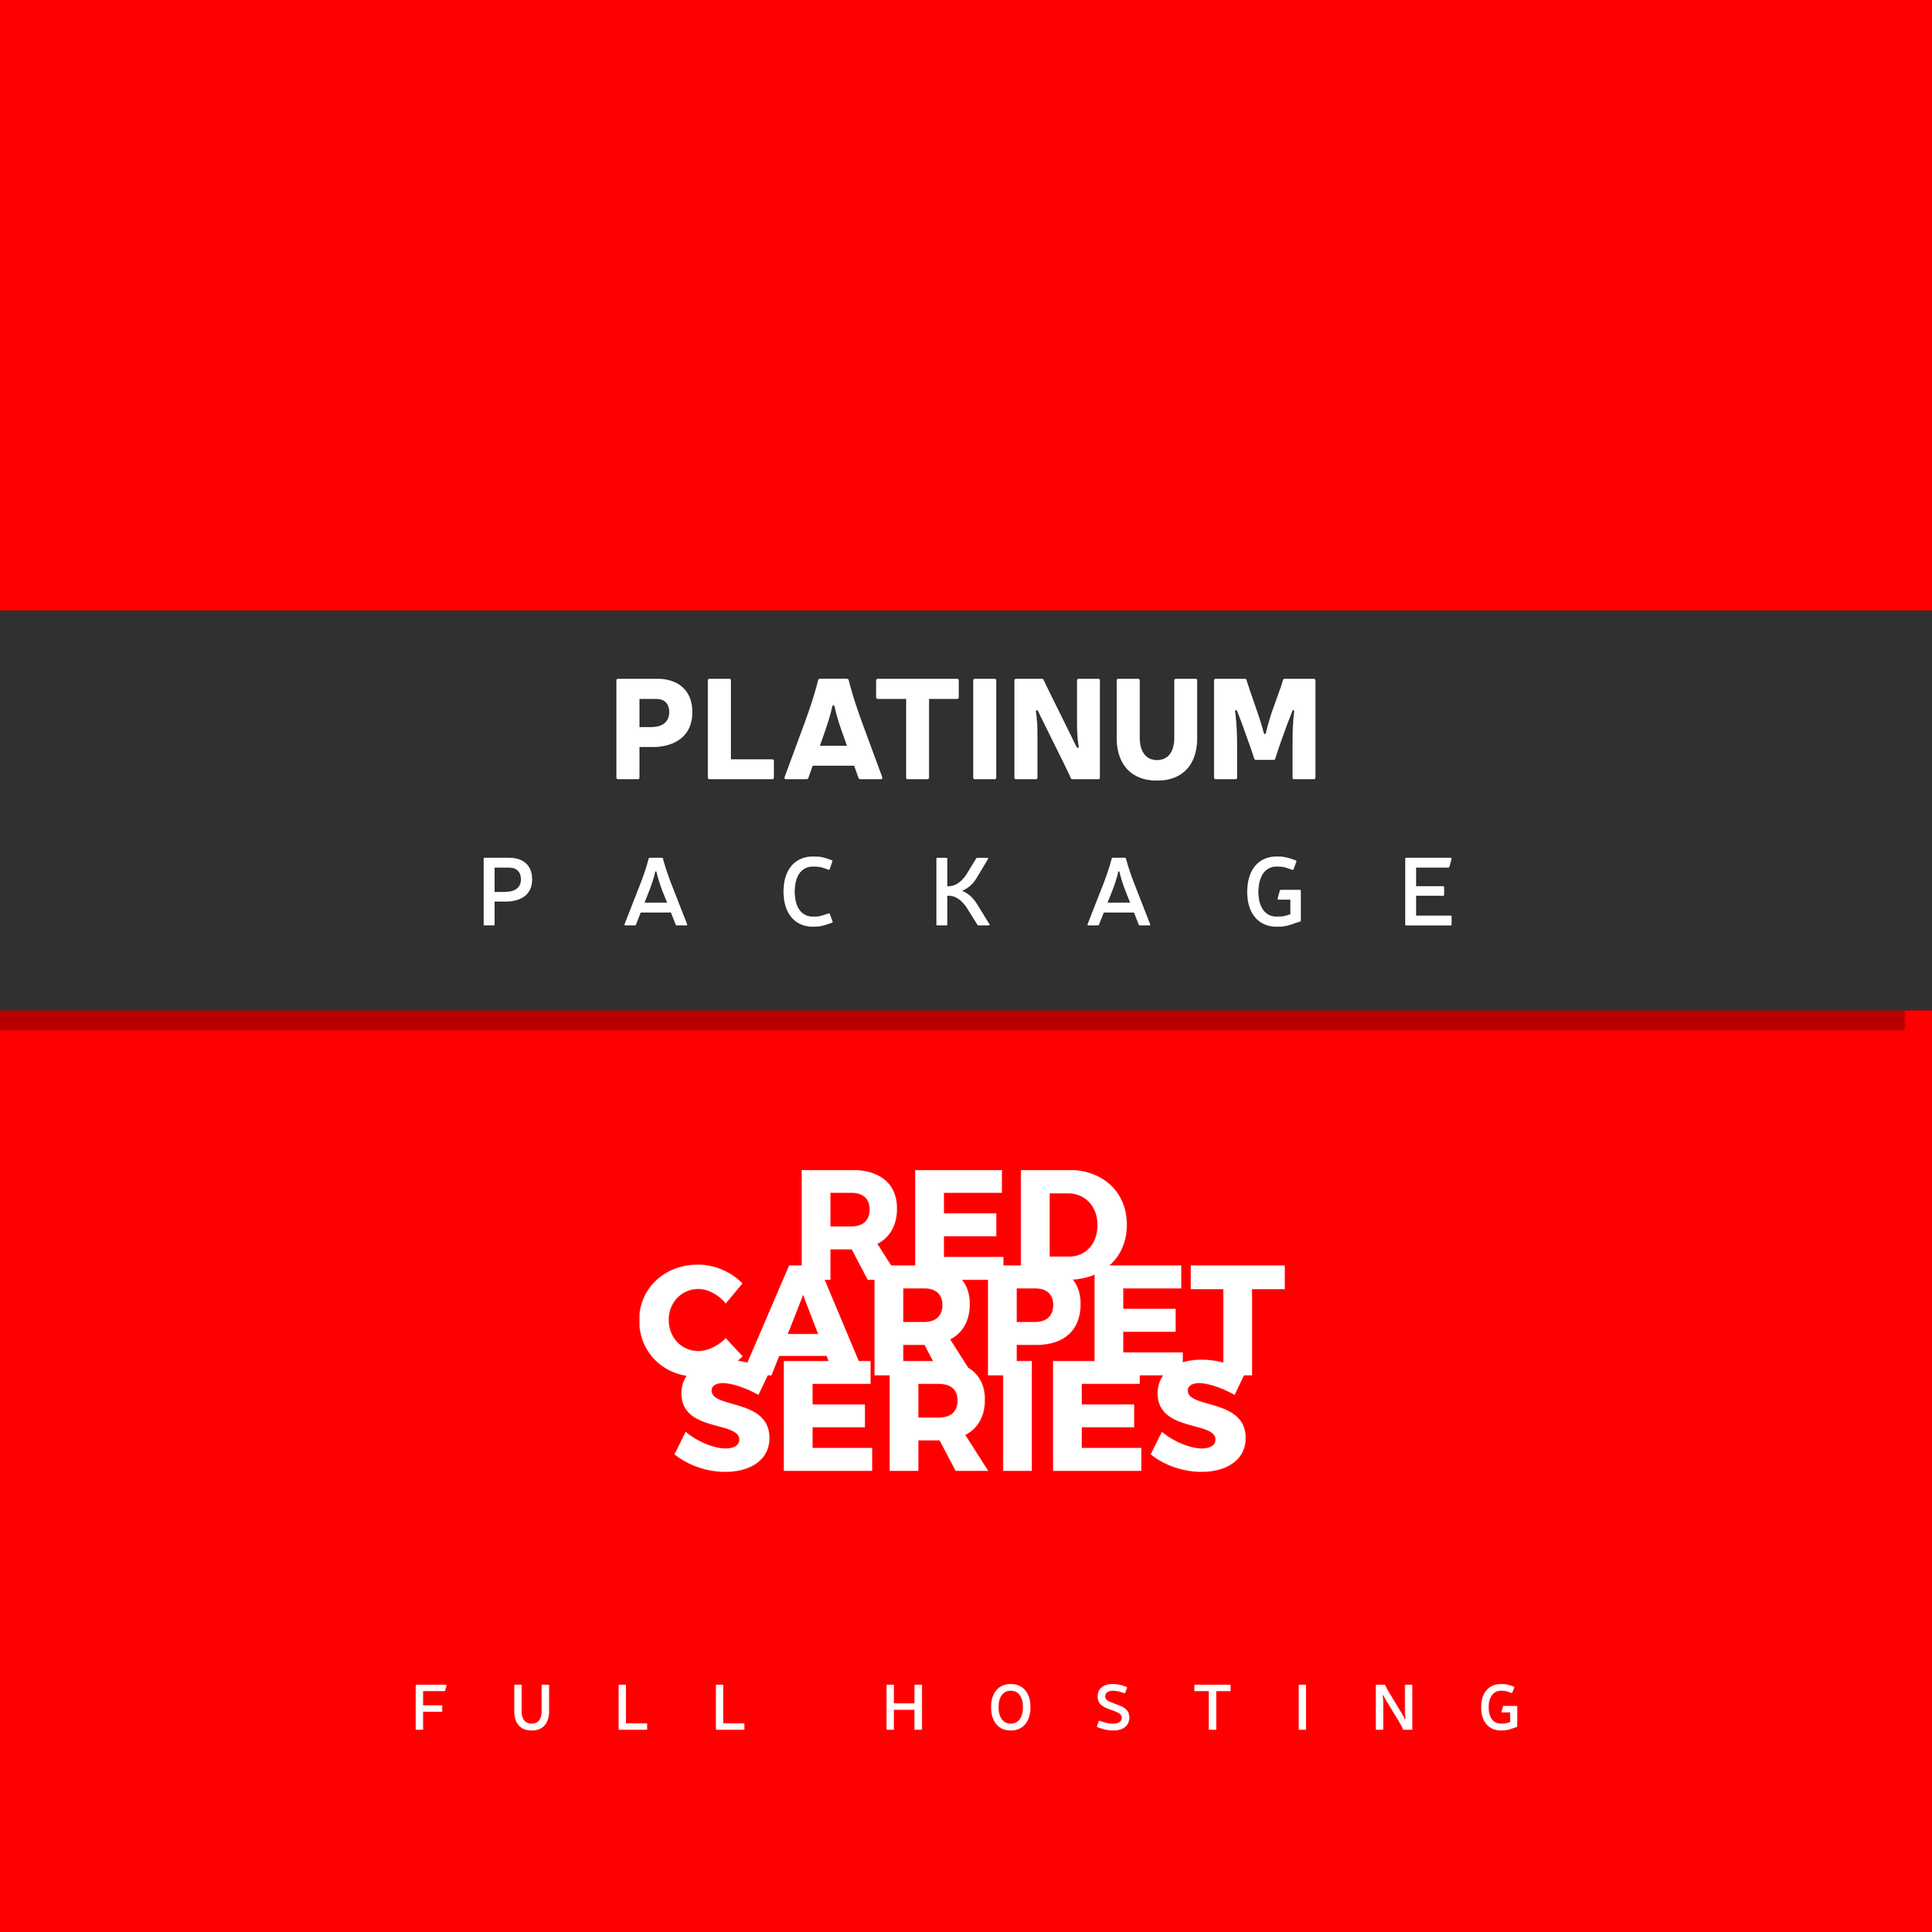 Red-Carpet-Series---PLATINUM-PACKAGE.png